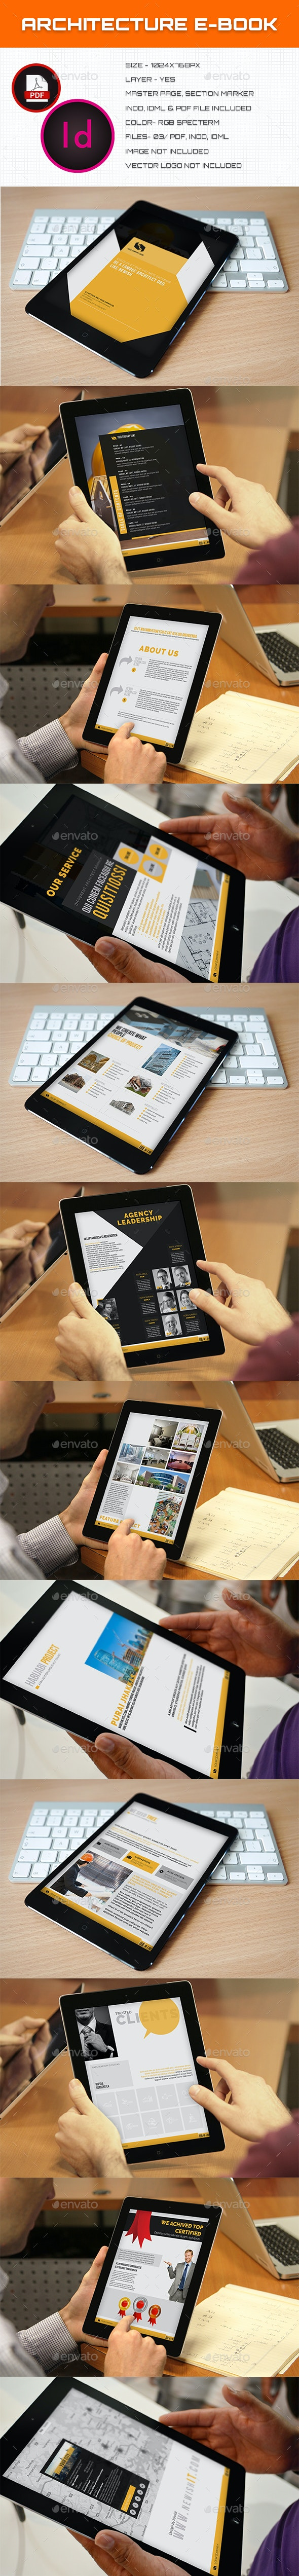 Architect Profile E-book - Digital Books ePublishing